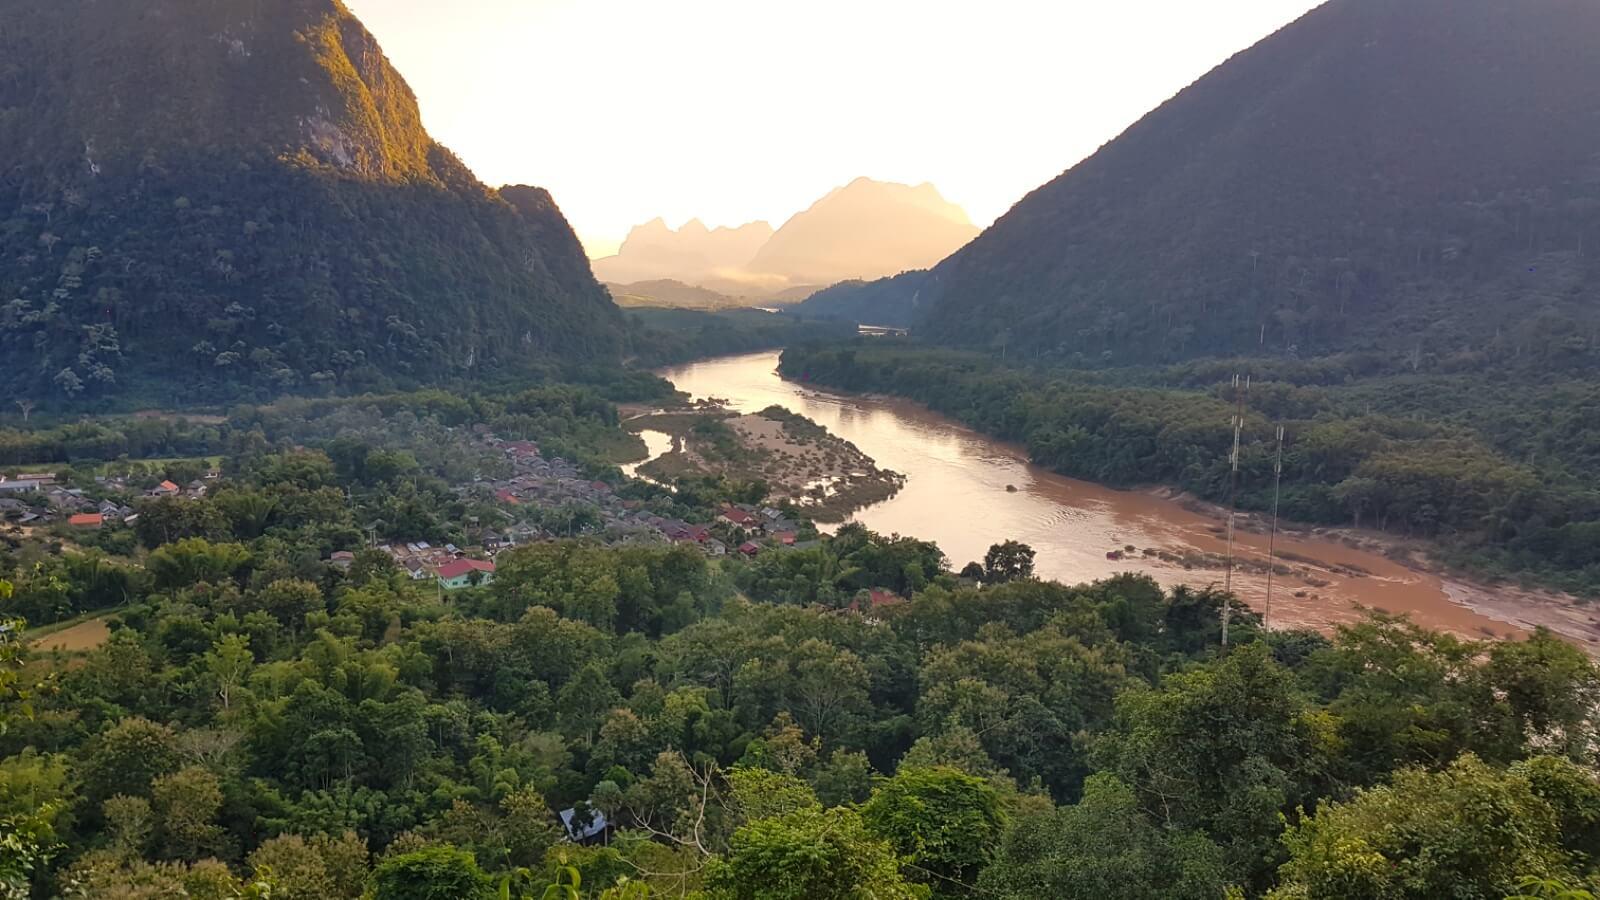 Muang Ngoi - Wanderungen und der zauberhafteste Ort in Laos